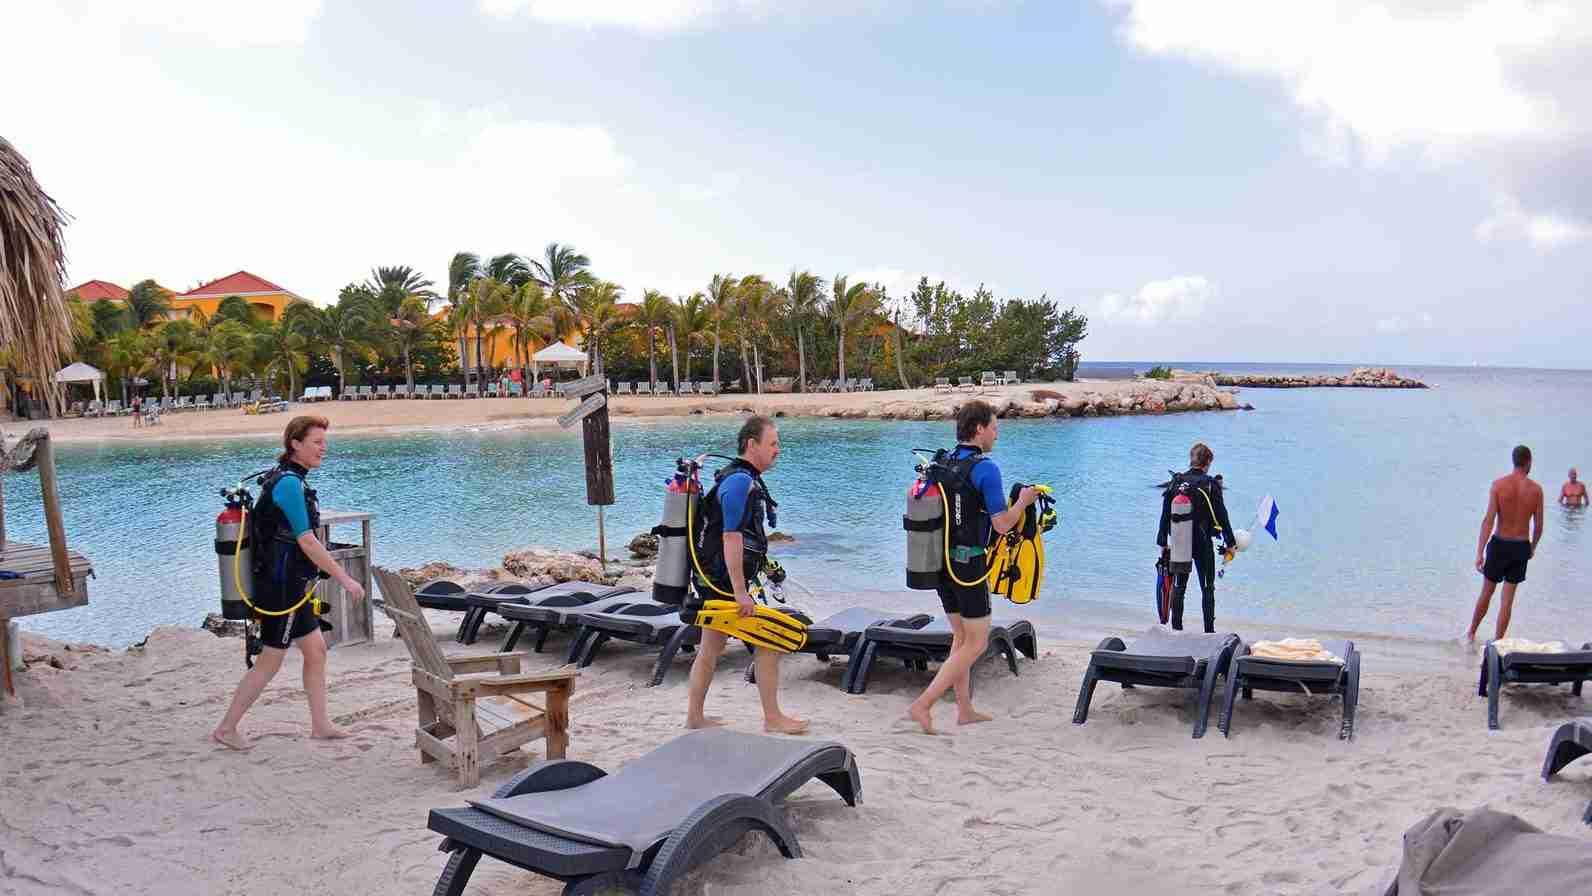 Guided Shore Diving at LionsDive Beach Resort | Ocean Encounters